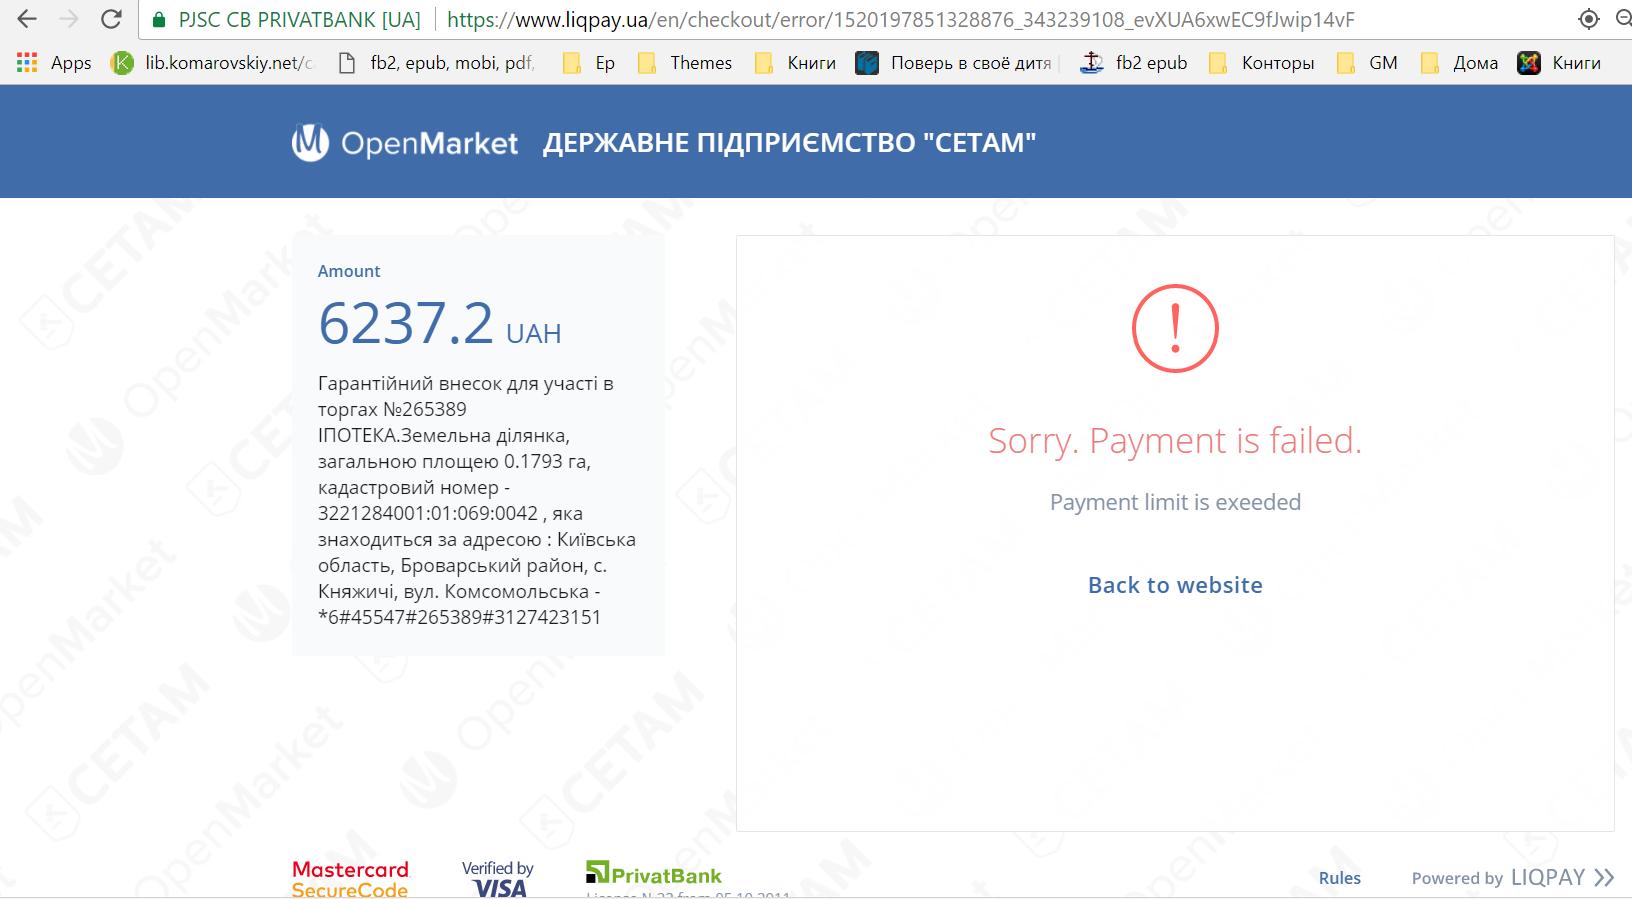 image http://forum.setam.net.ua/assets/images/310-hFUVG1Condtk5fW2.png